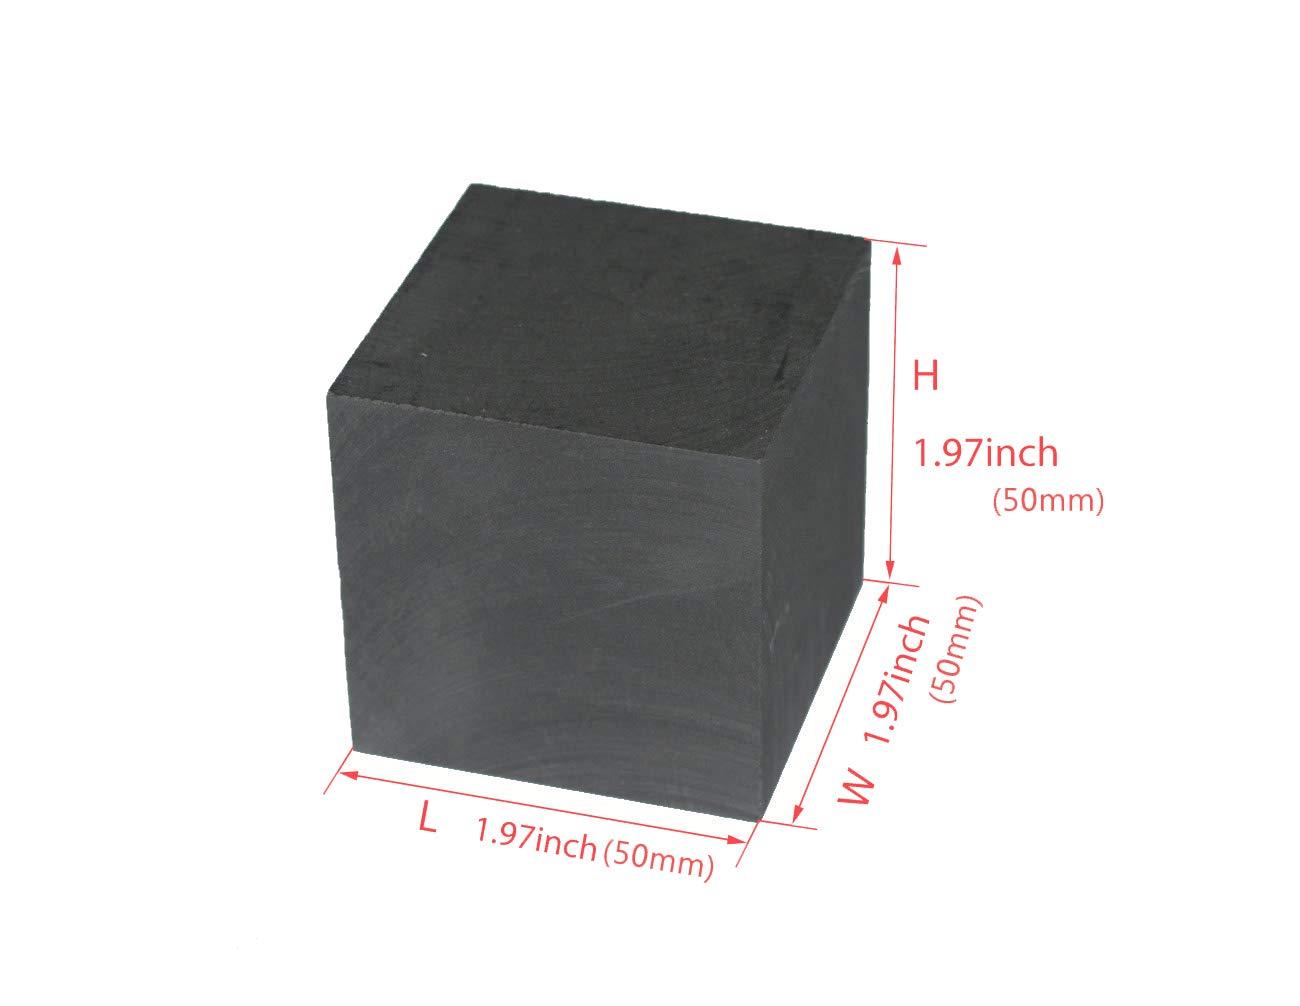 SZQL 99.9/% Purity Graphite Ingot Block EDM Graphite Plate Milling Surface Graphite Round,50x5mm